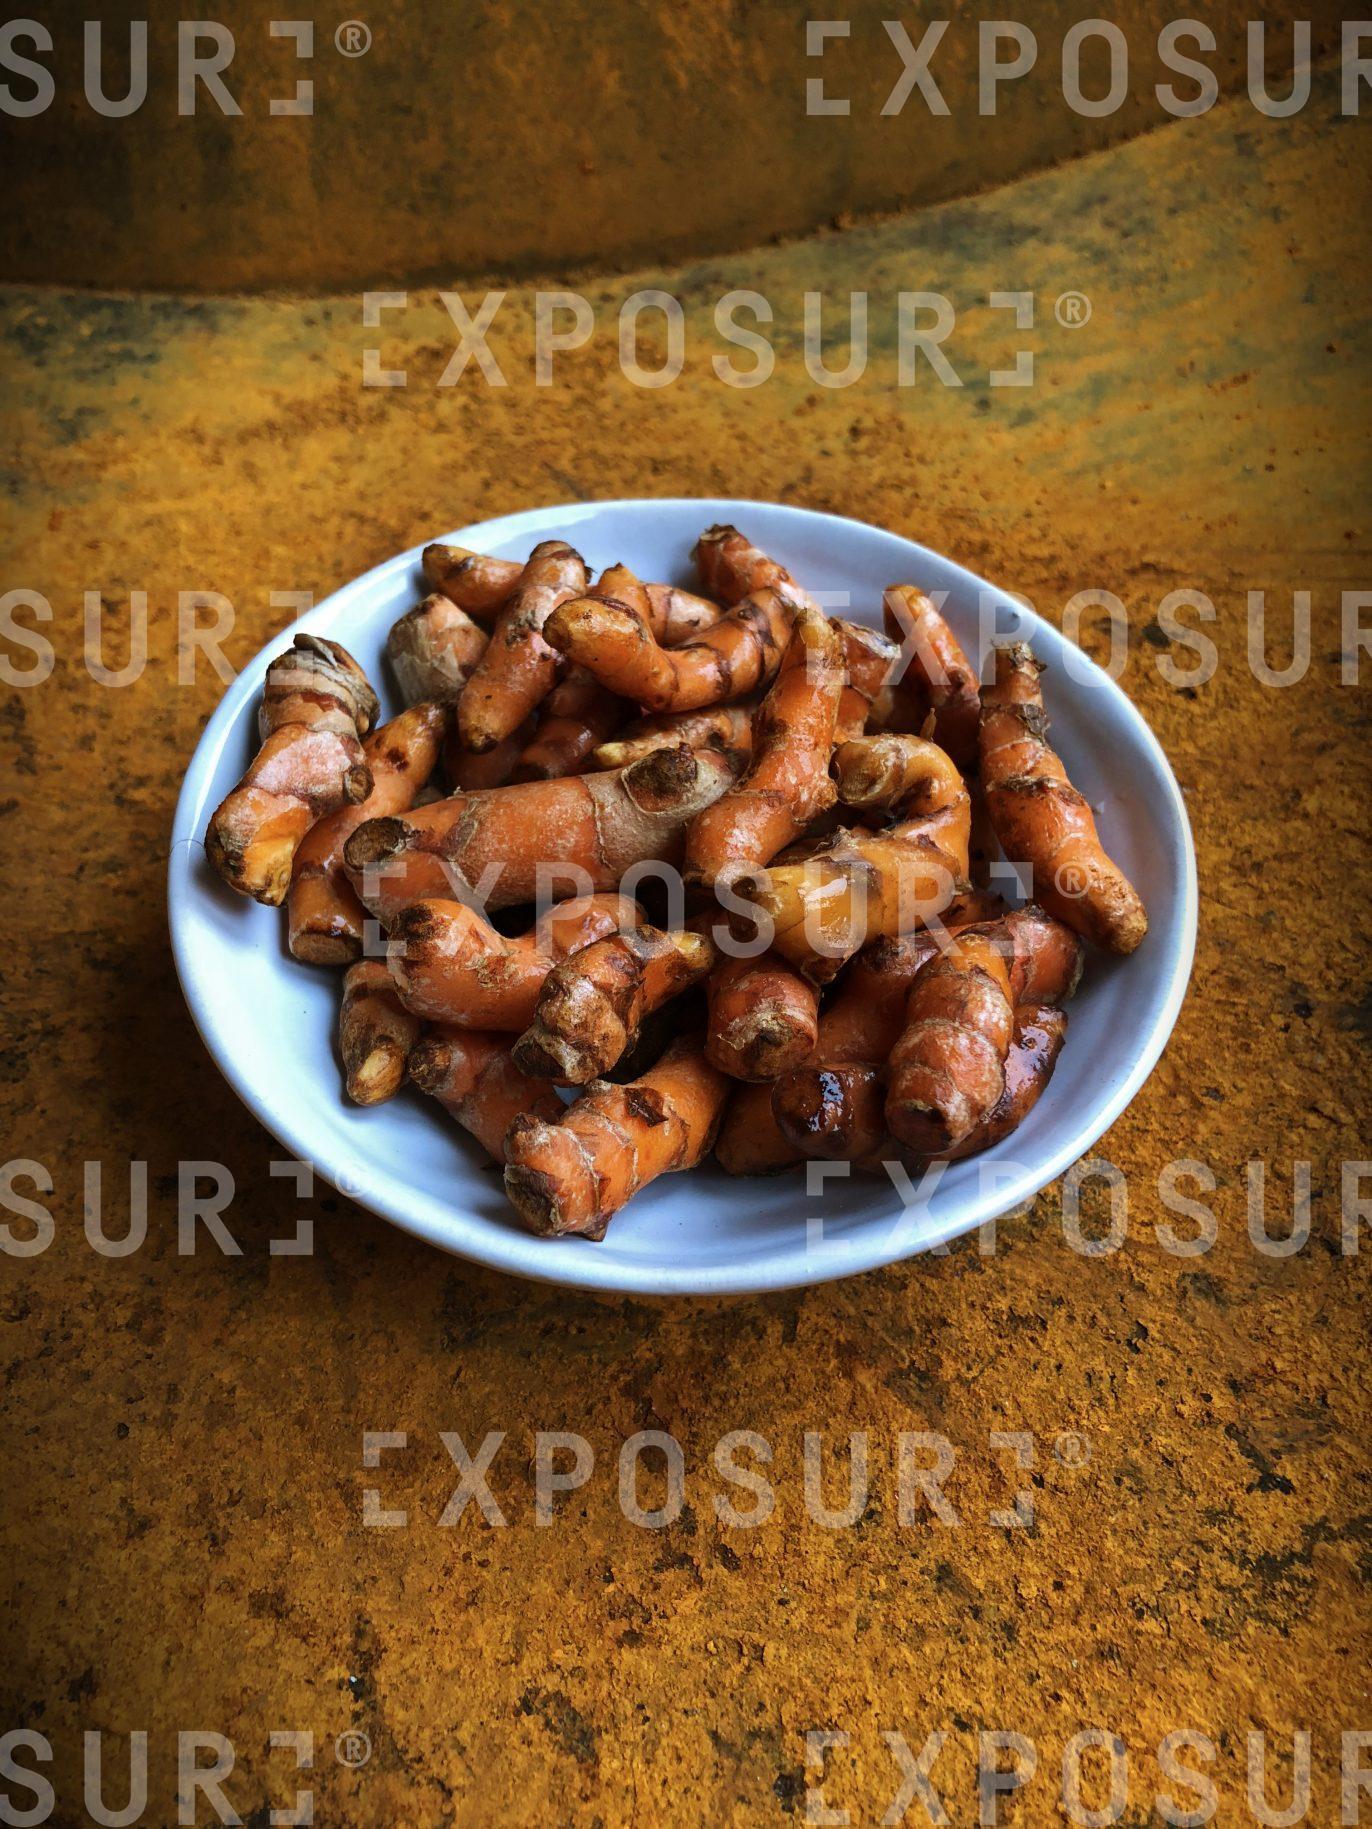 Turmeric root